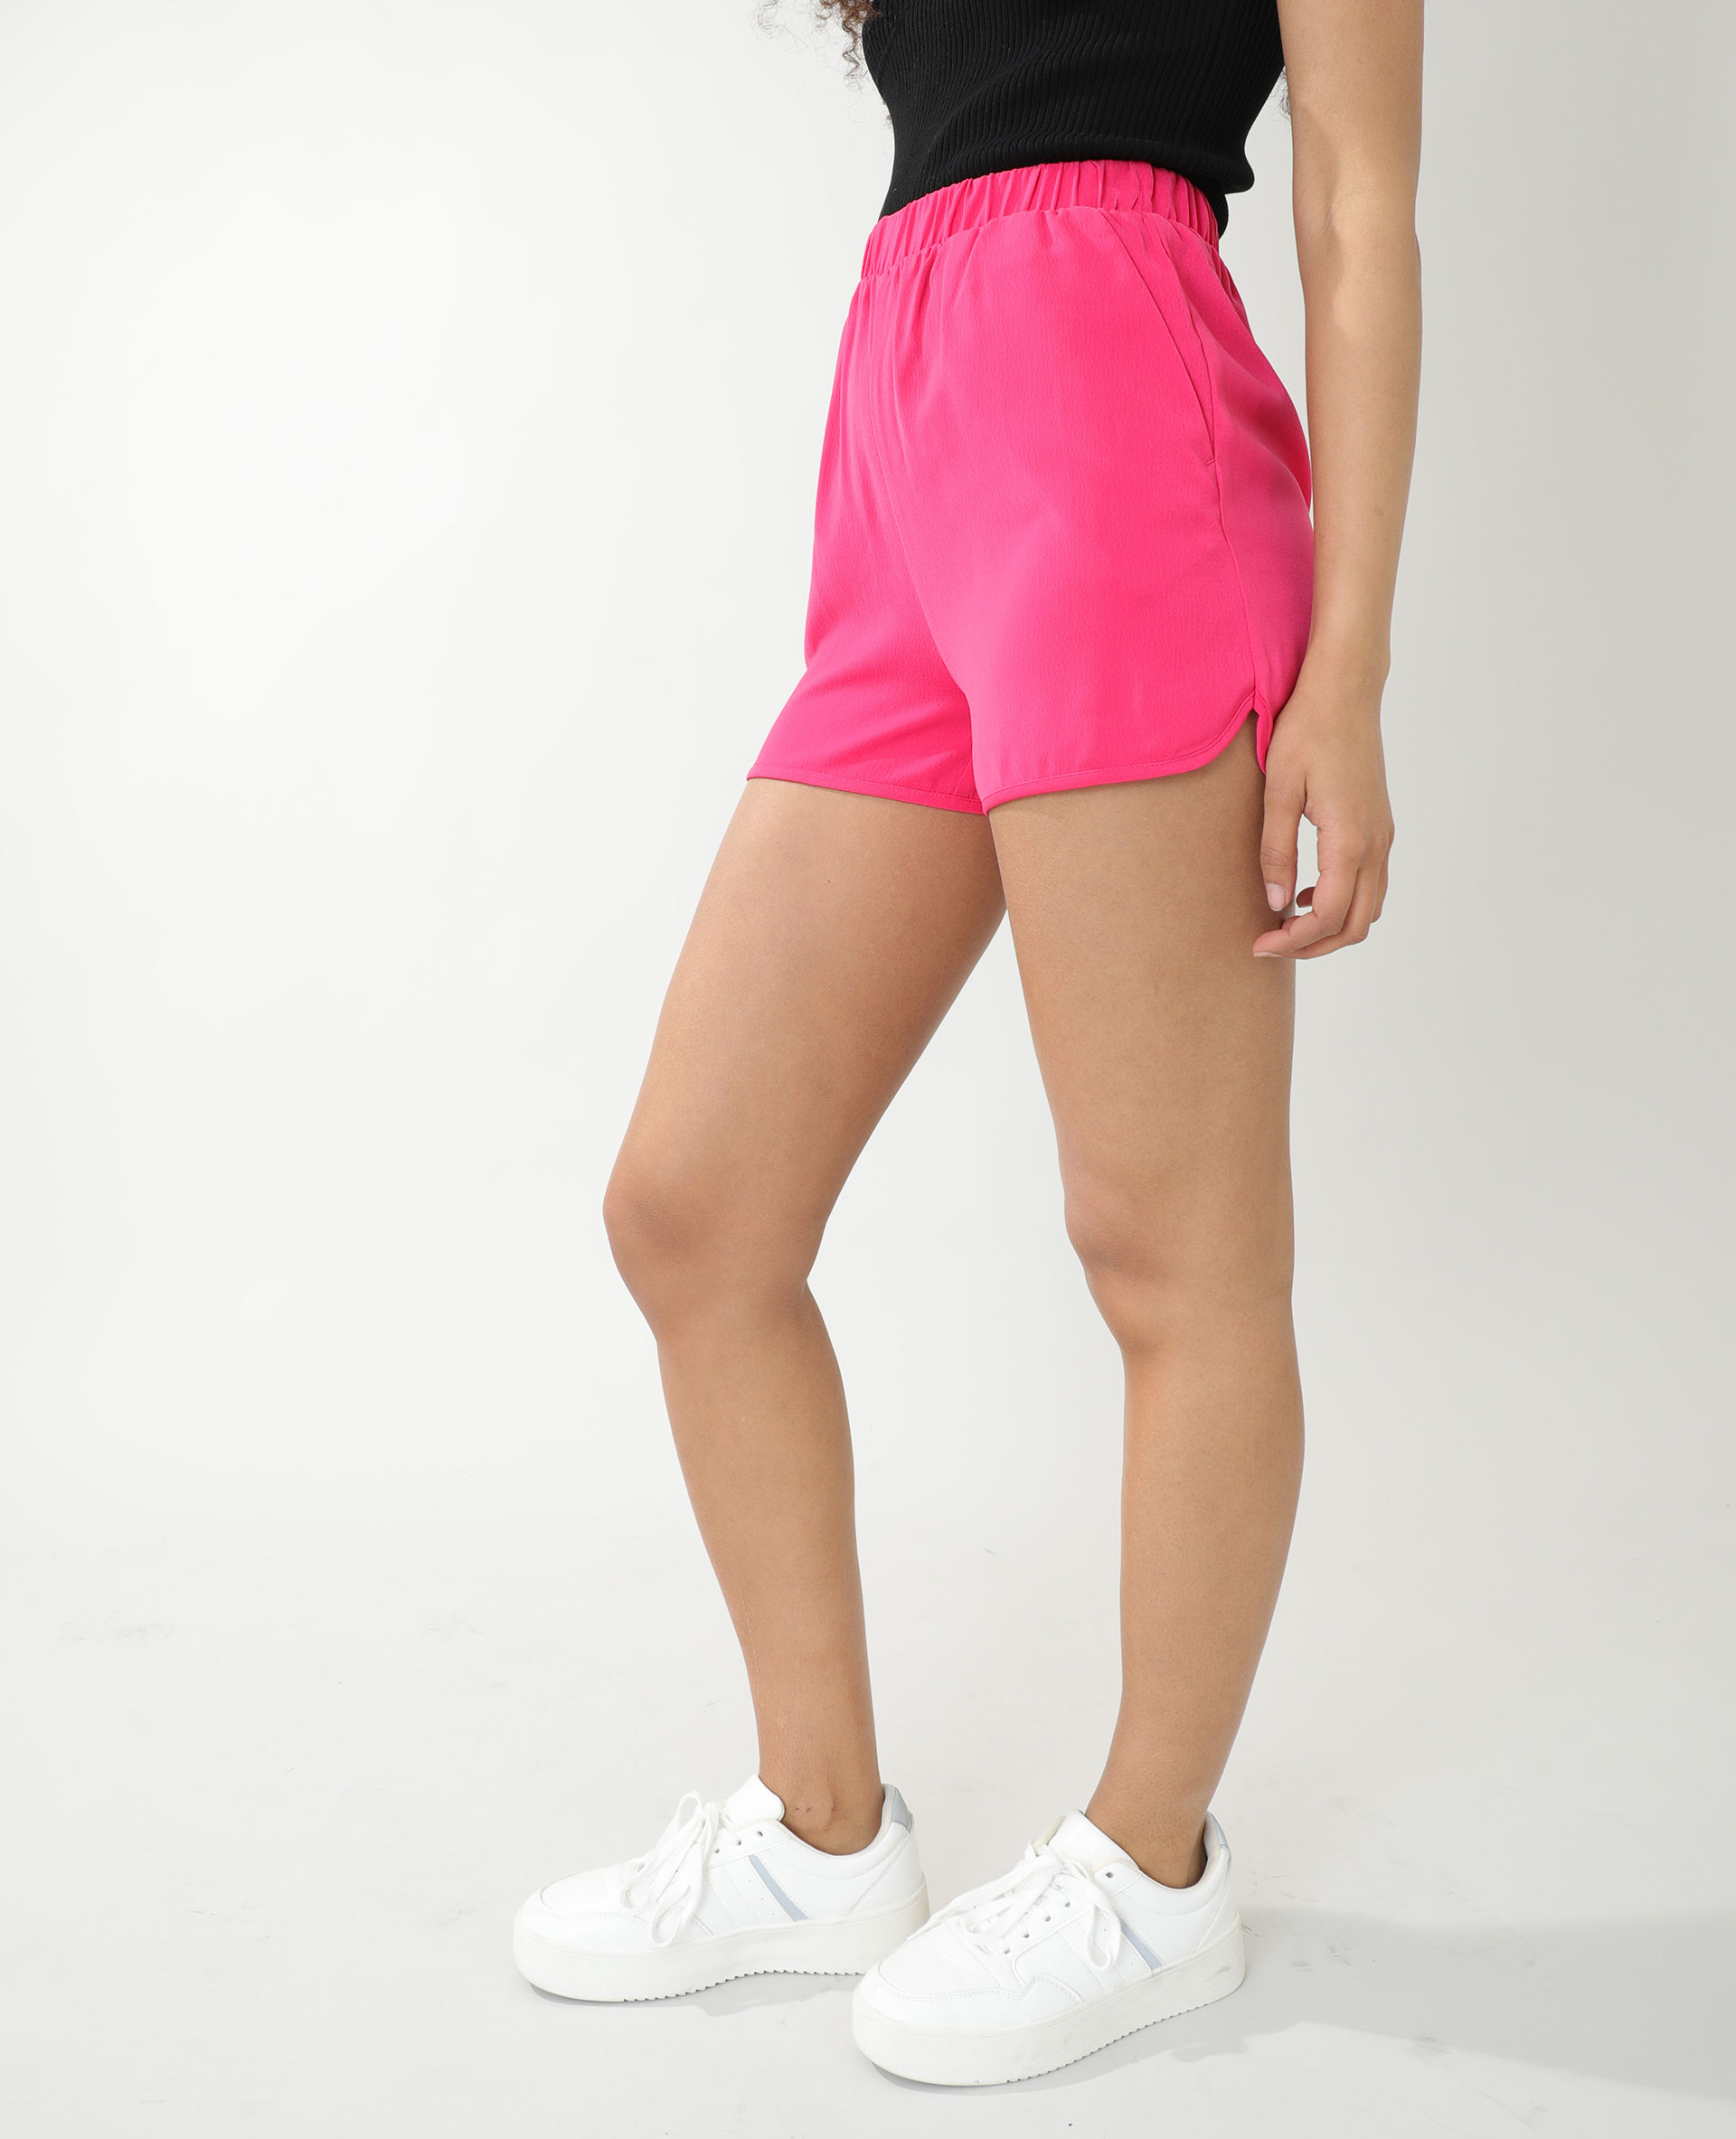 Soepele short roze - Pimkie